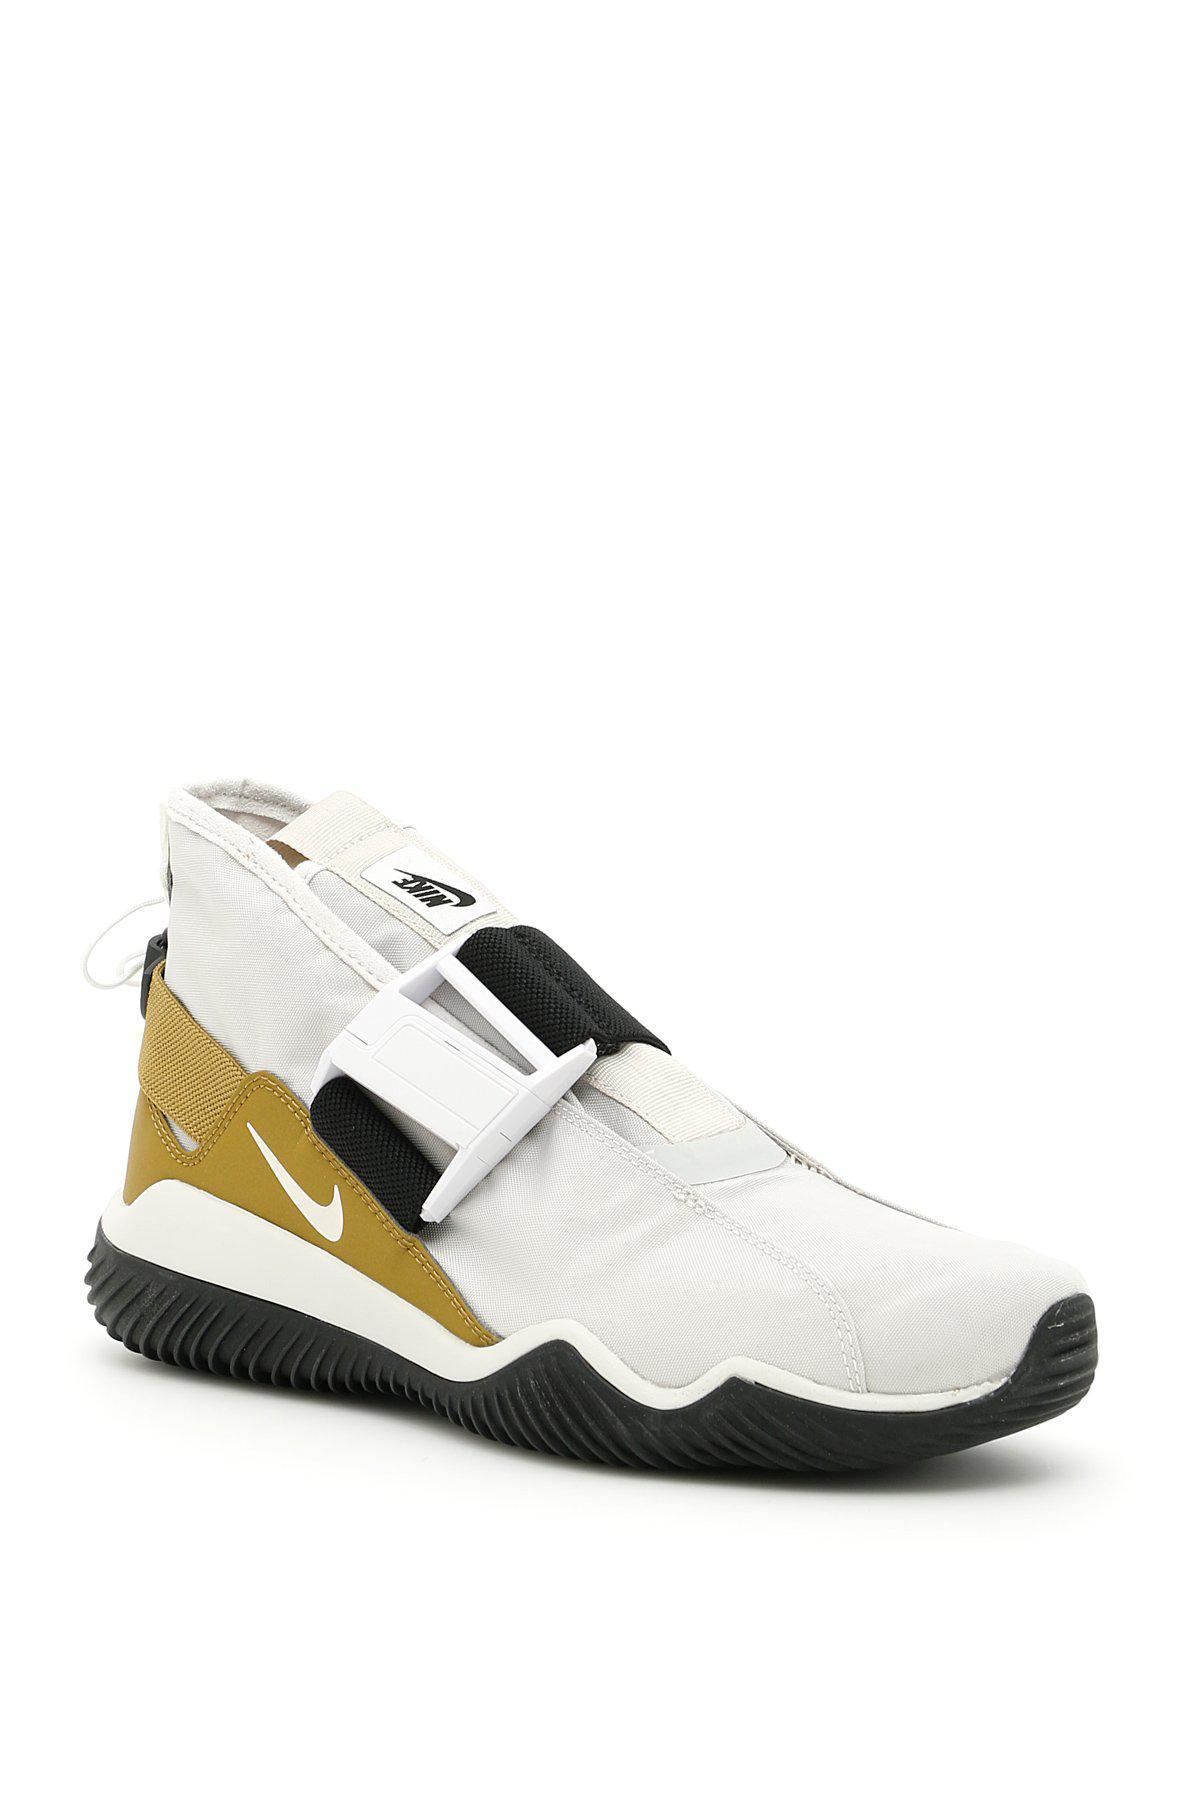 low cost 5627d a2ea9 Nike Komyuter Se Sneakers in White for Men - Lyst